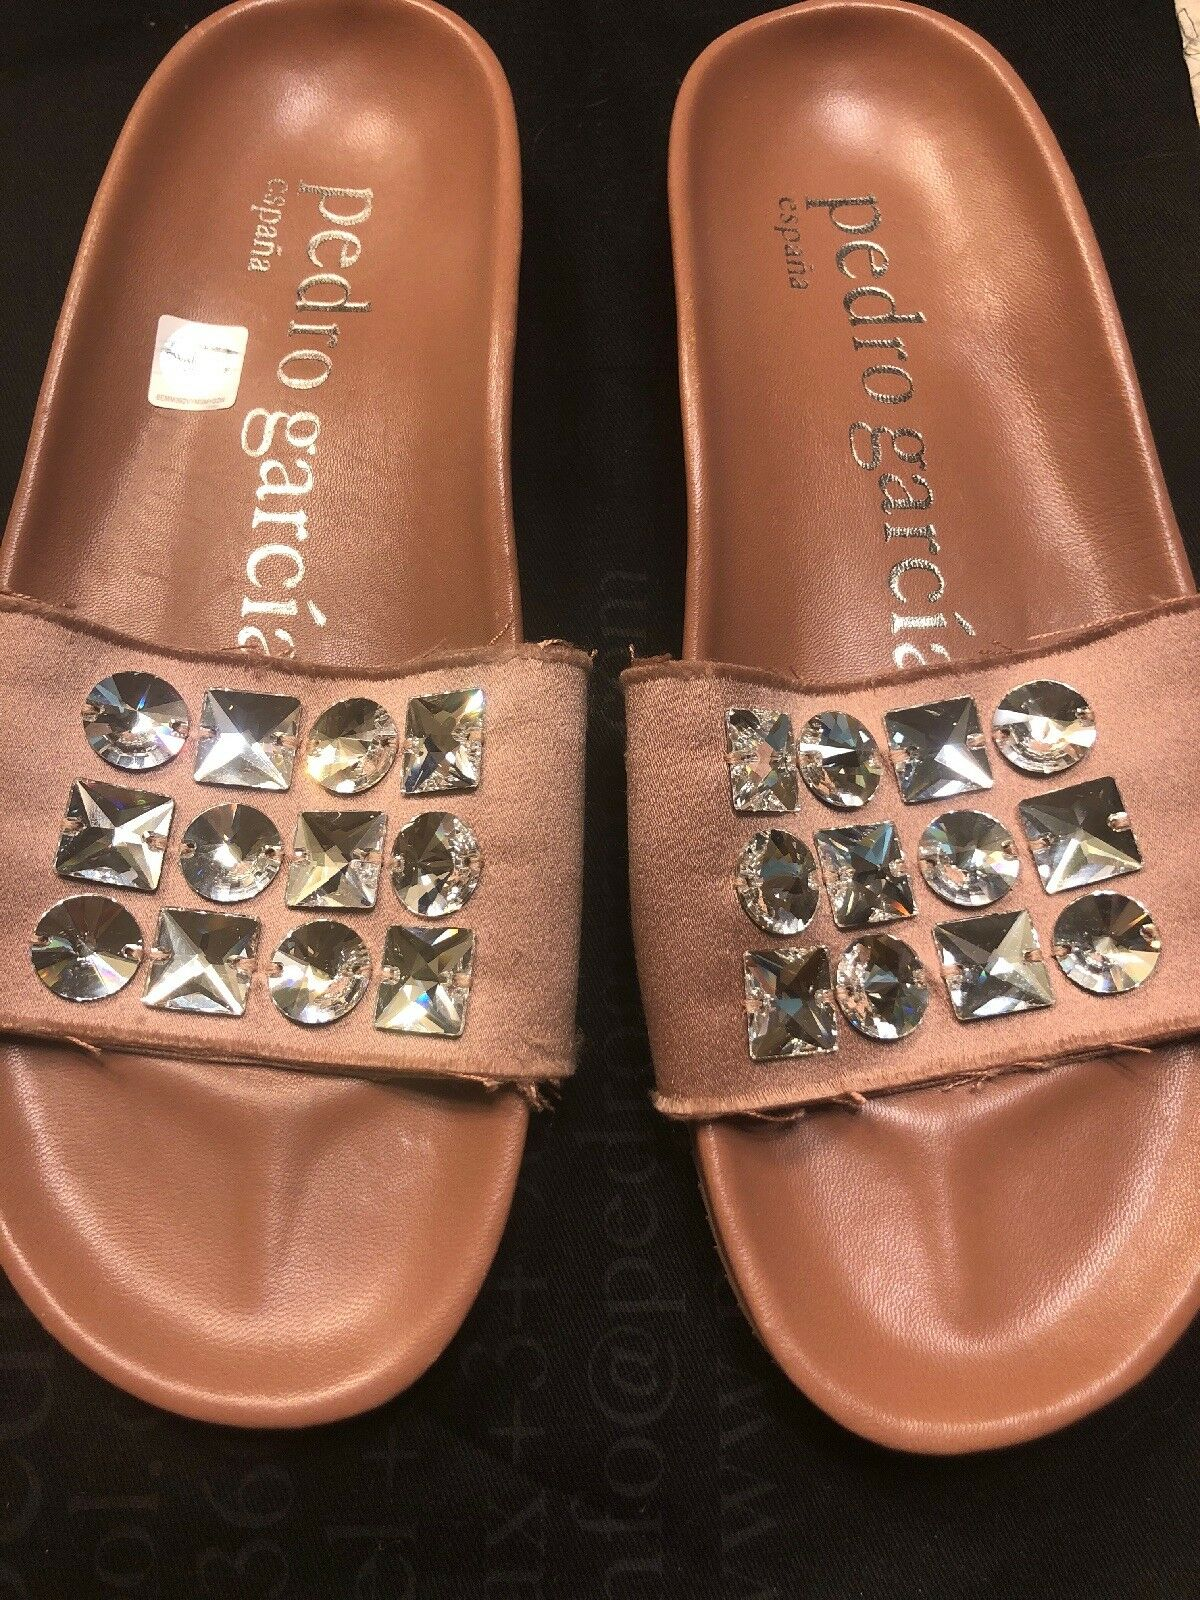 Pedro Garcia Amery de cristal cristal cristal adornado diapositiva de Satén Sandalias De Mujer Talla 37 M  venderse como panqueques